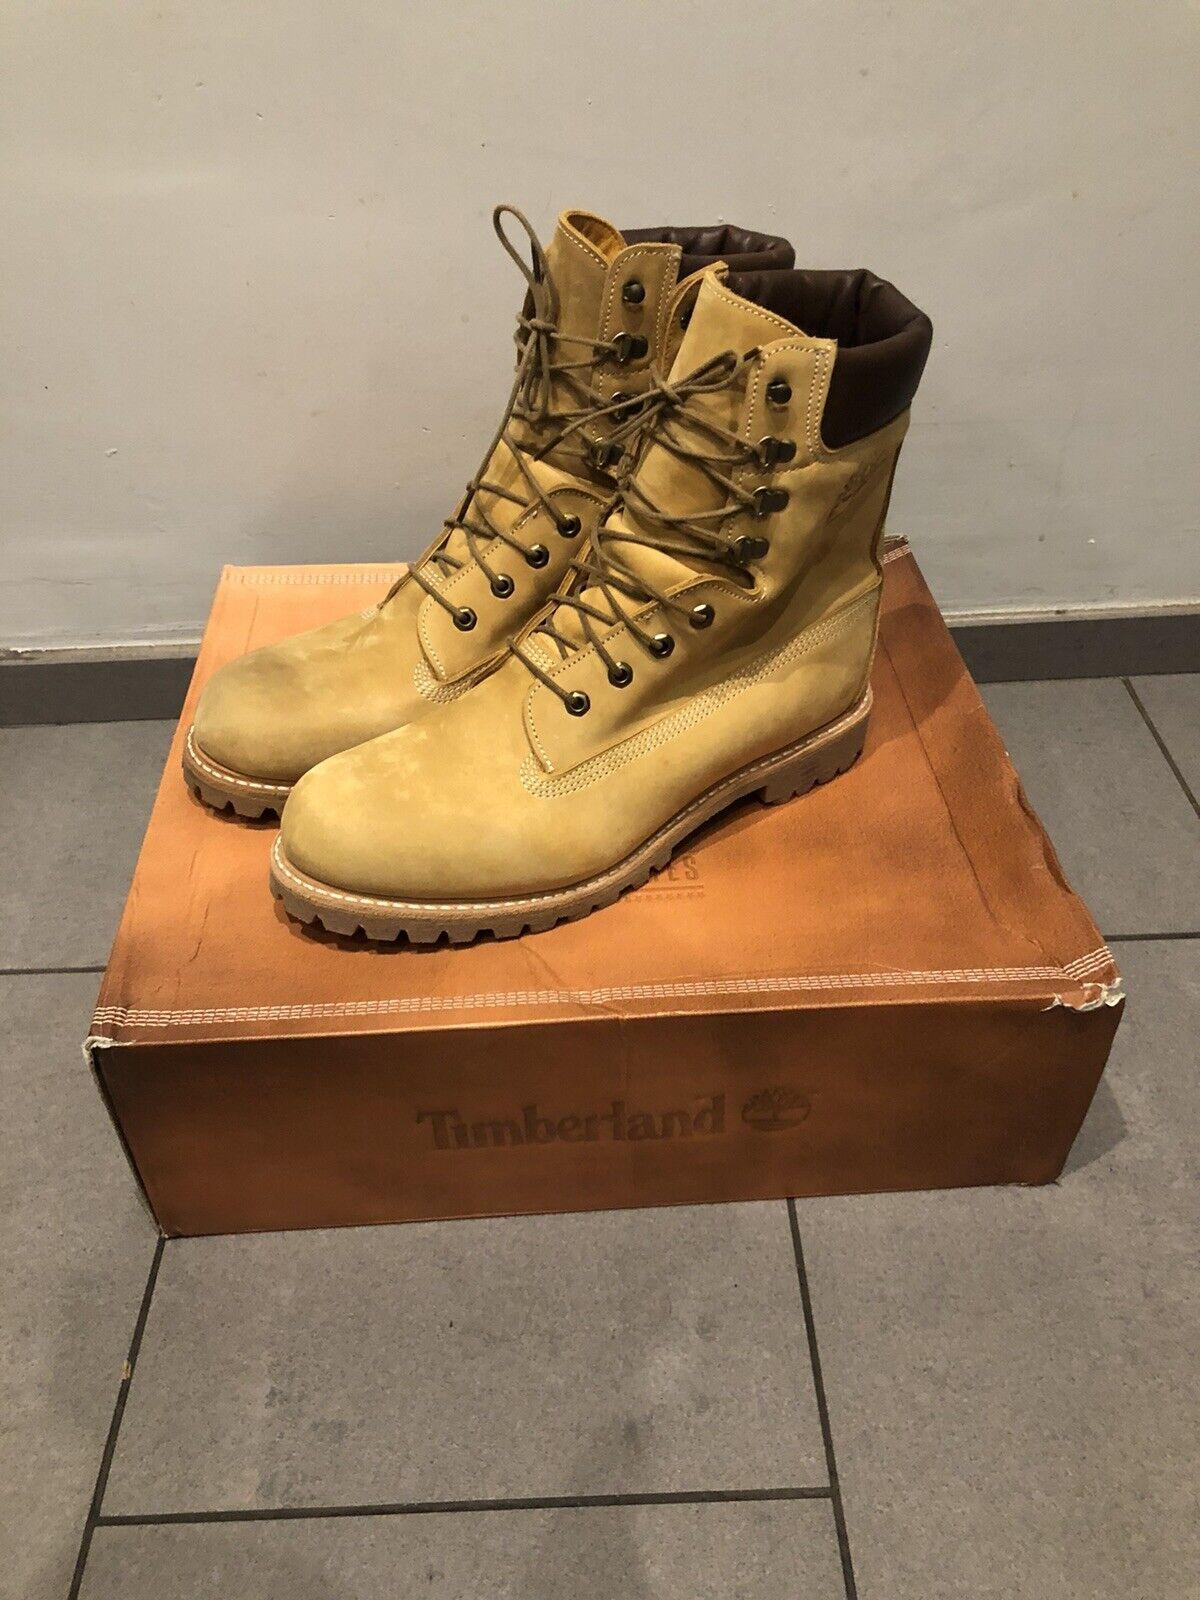 Timberland 8 Inch Boot Made in USA - UK11.5 / US12 / EU46